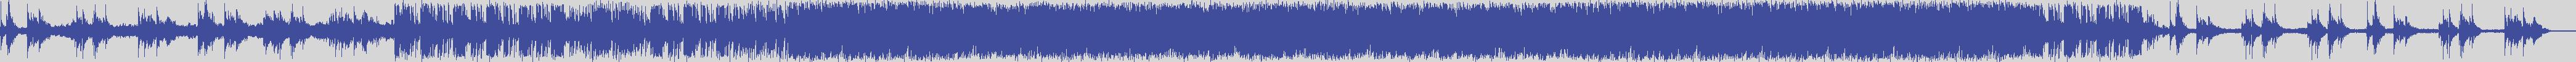 worldwide_music_records [WMR004] Max Riolo - A Silvia [Original Mix] audio wave form